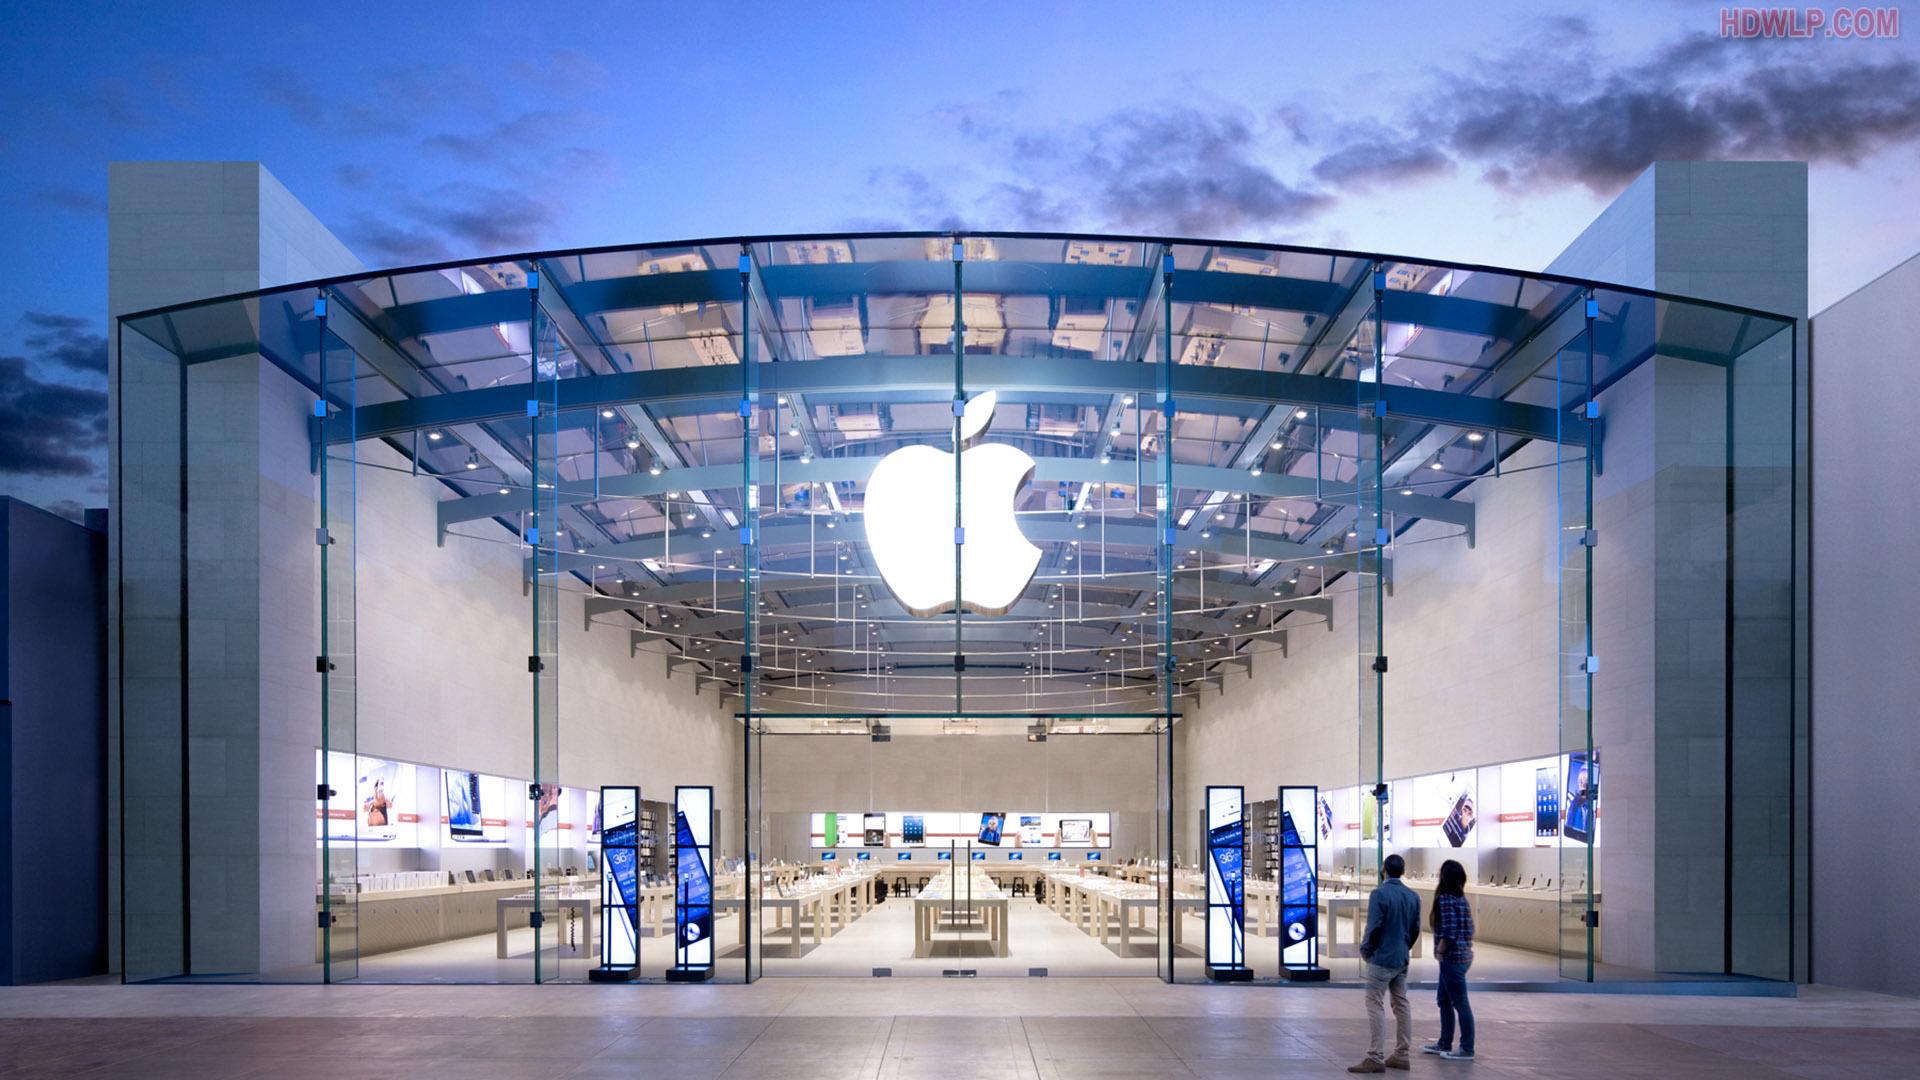 Apple Store HD Wallpaper | HDWLP COM